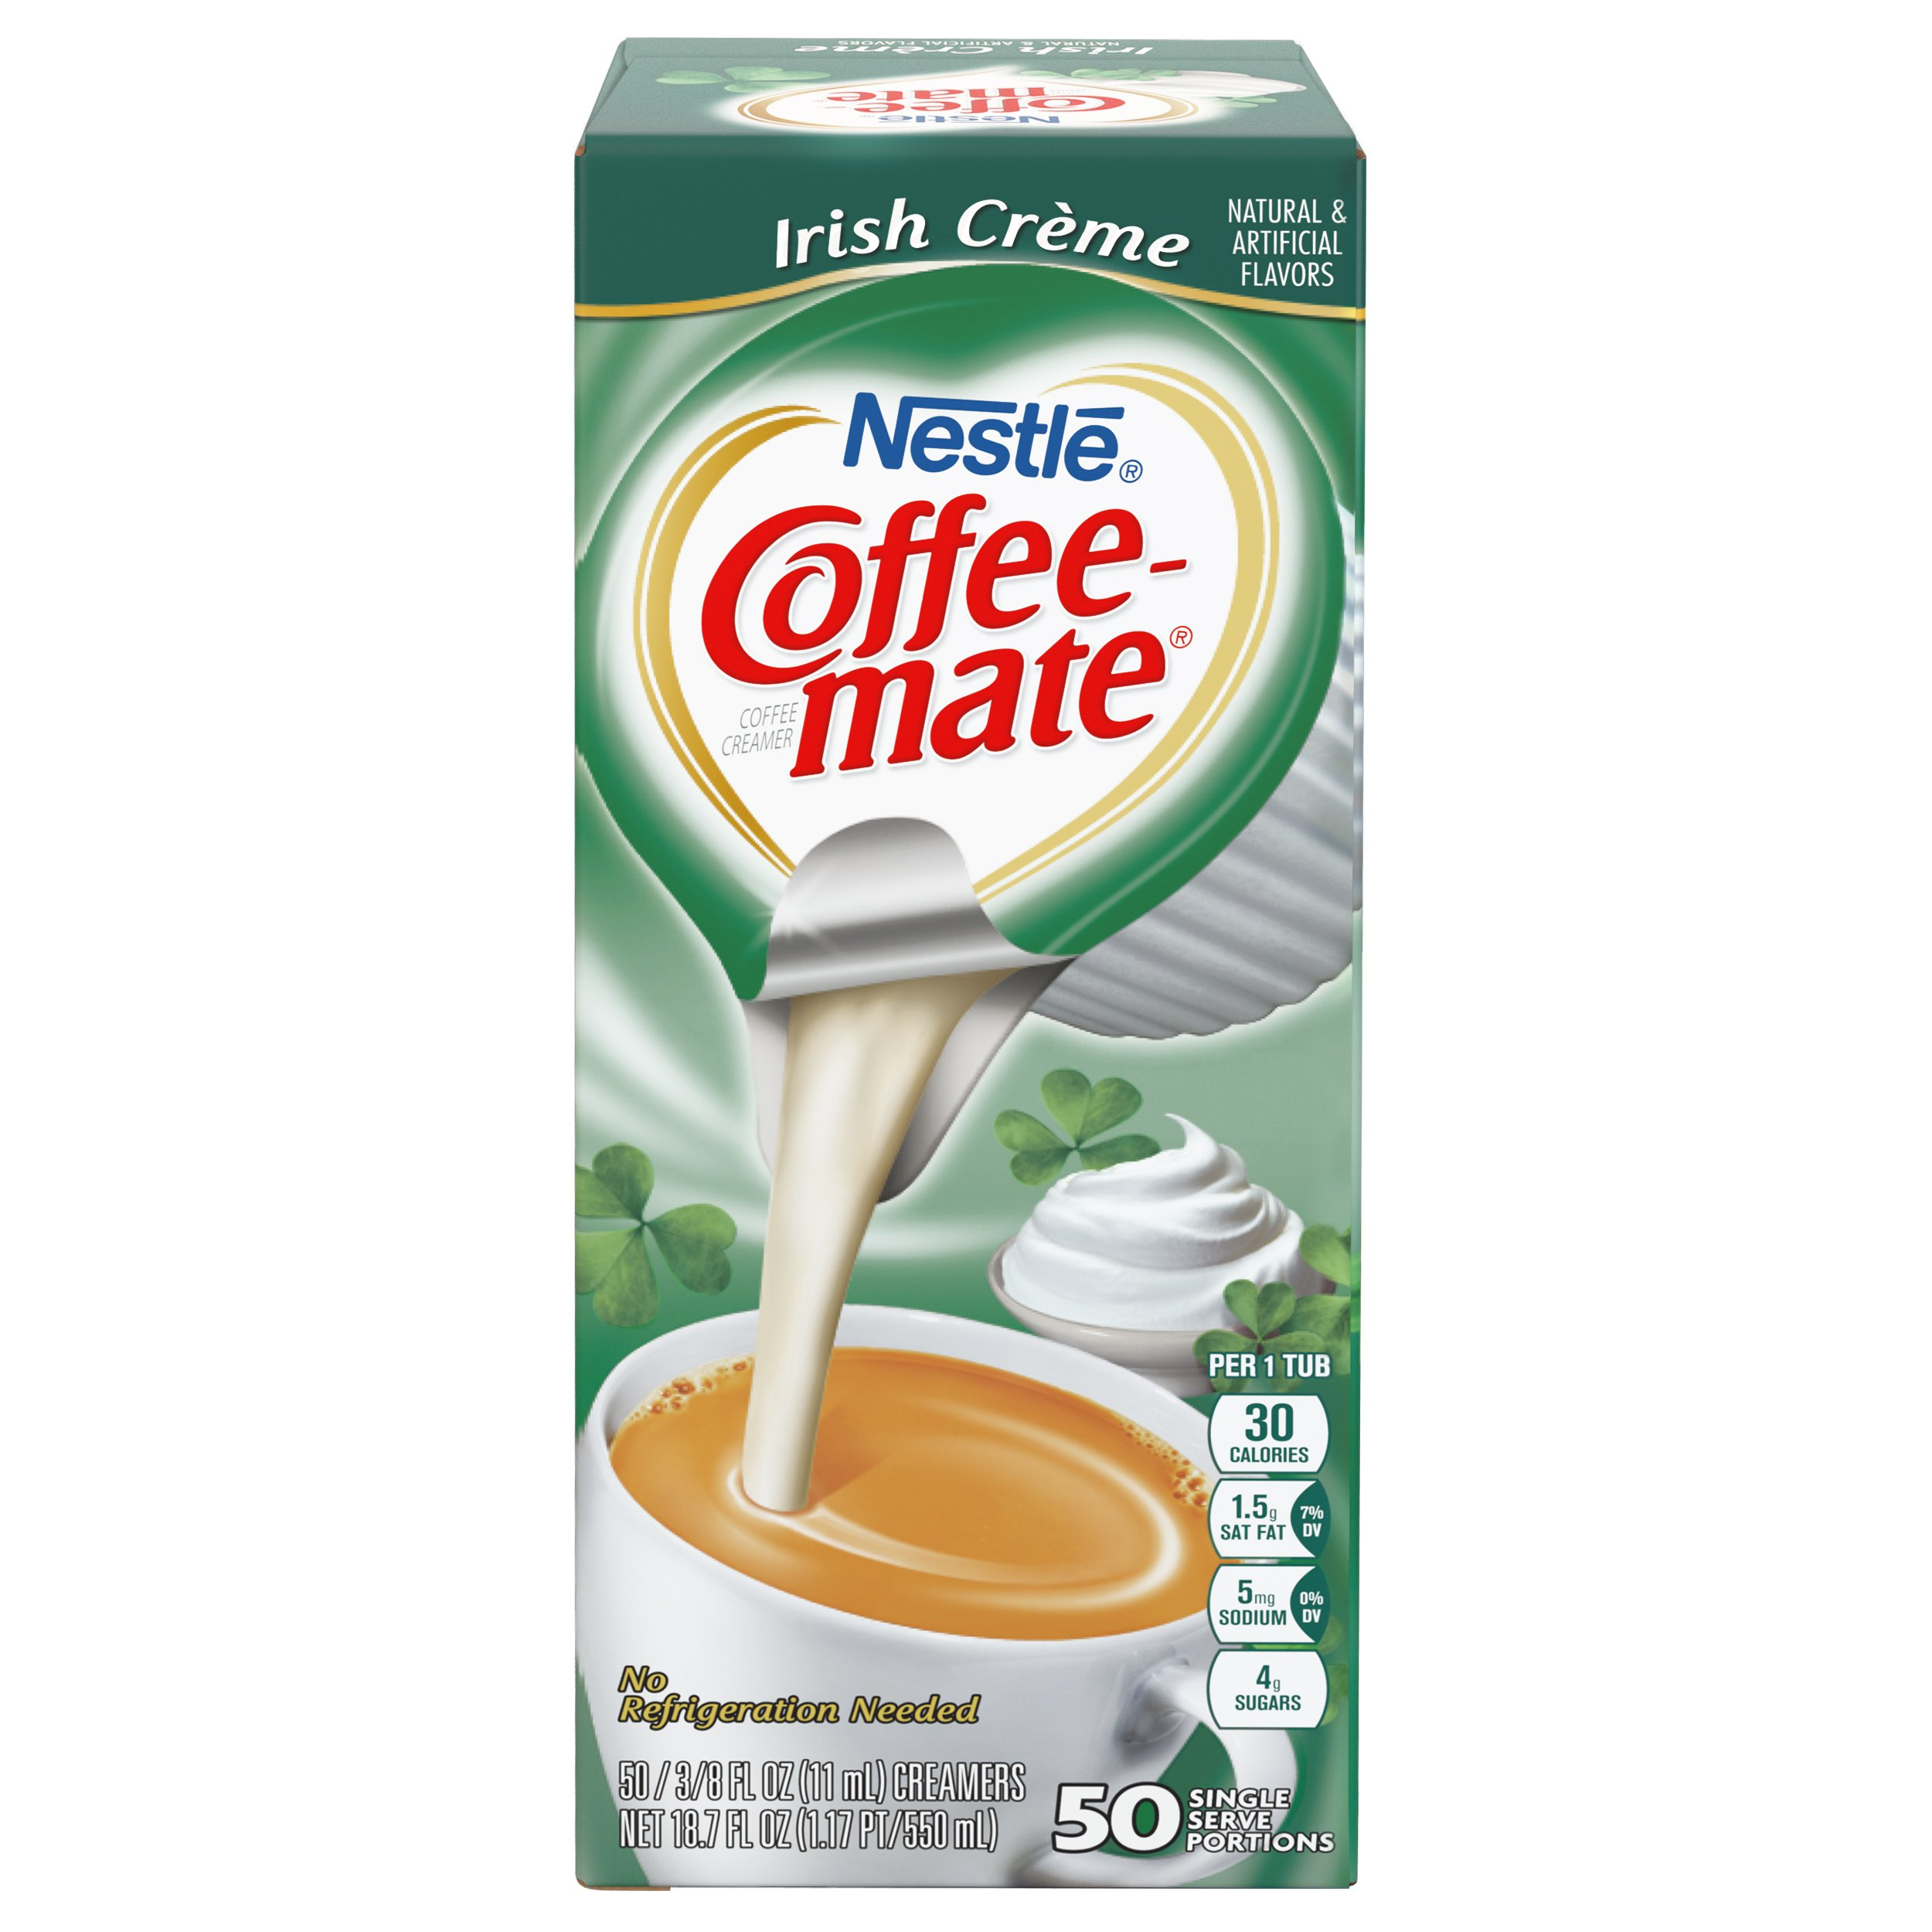 NESTLE COFFEE-MATE Coffee Creamer, Irish Creme, liquid creamer singles, 50 Count (Pack of 4) by Nestle Coffee Mate (Image #4)